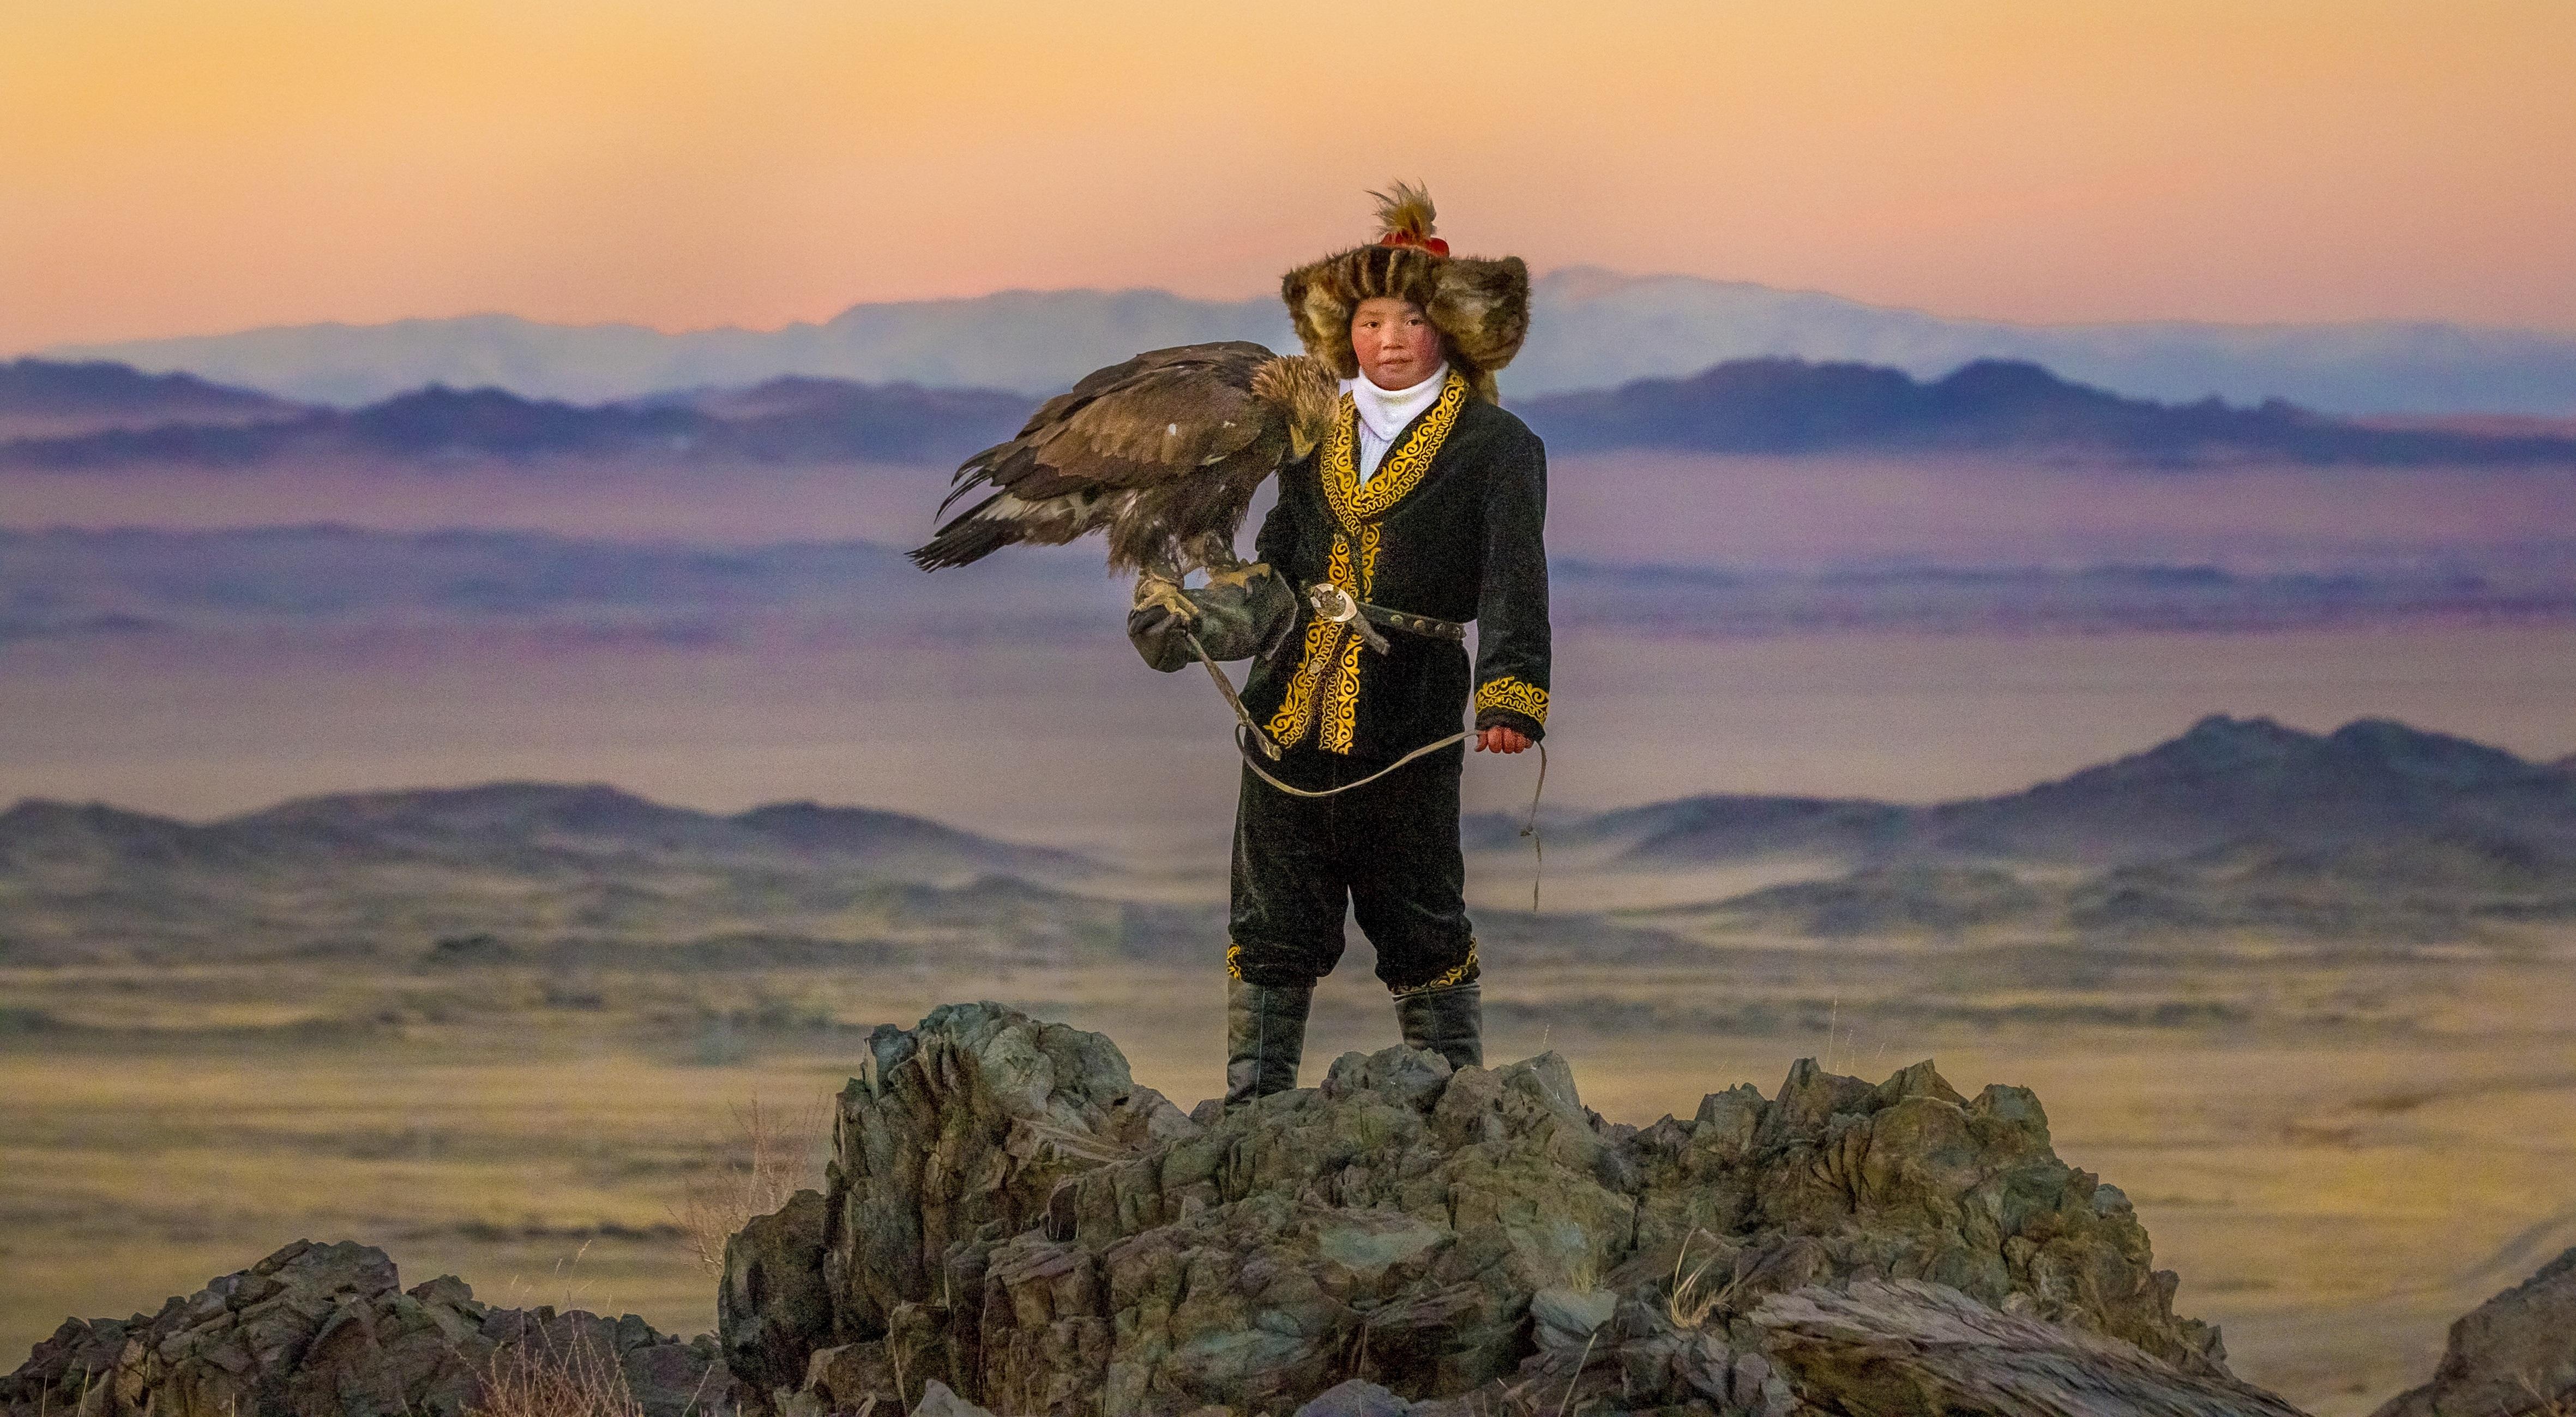 'Force Awakens' Star Daisy Ridley to Executive Produce Sundance Premiere Film 'The Eagle Huntress'